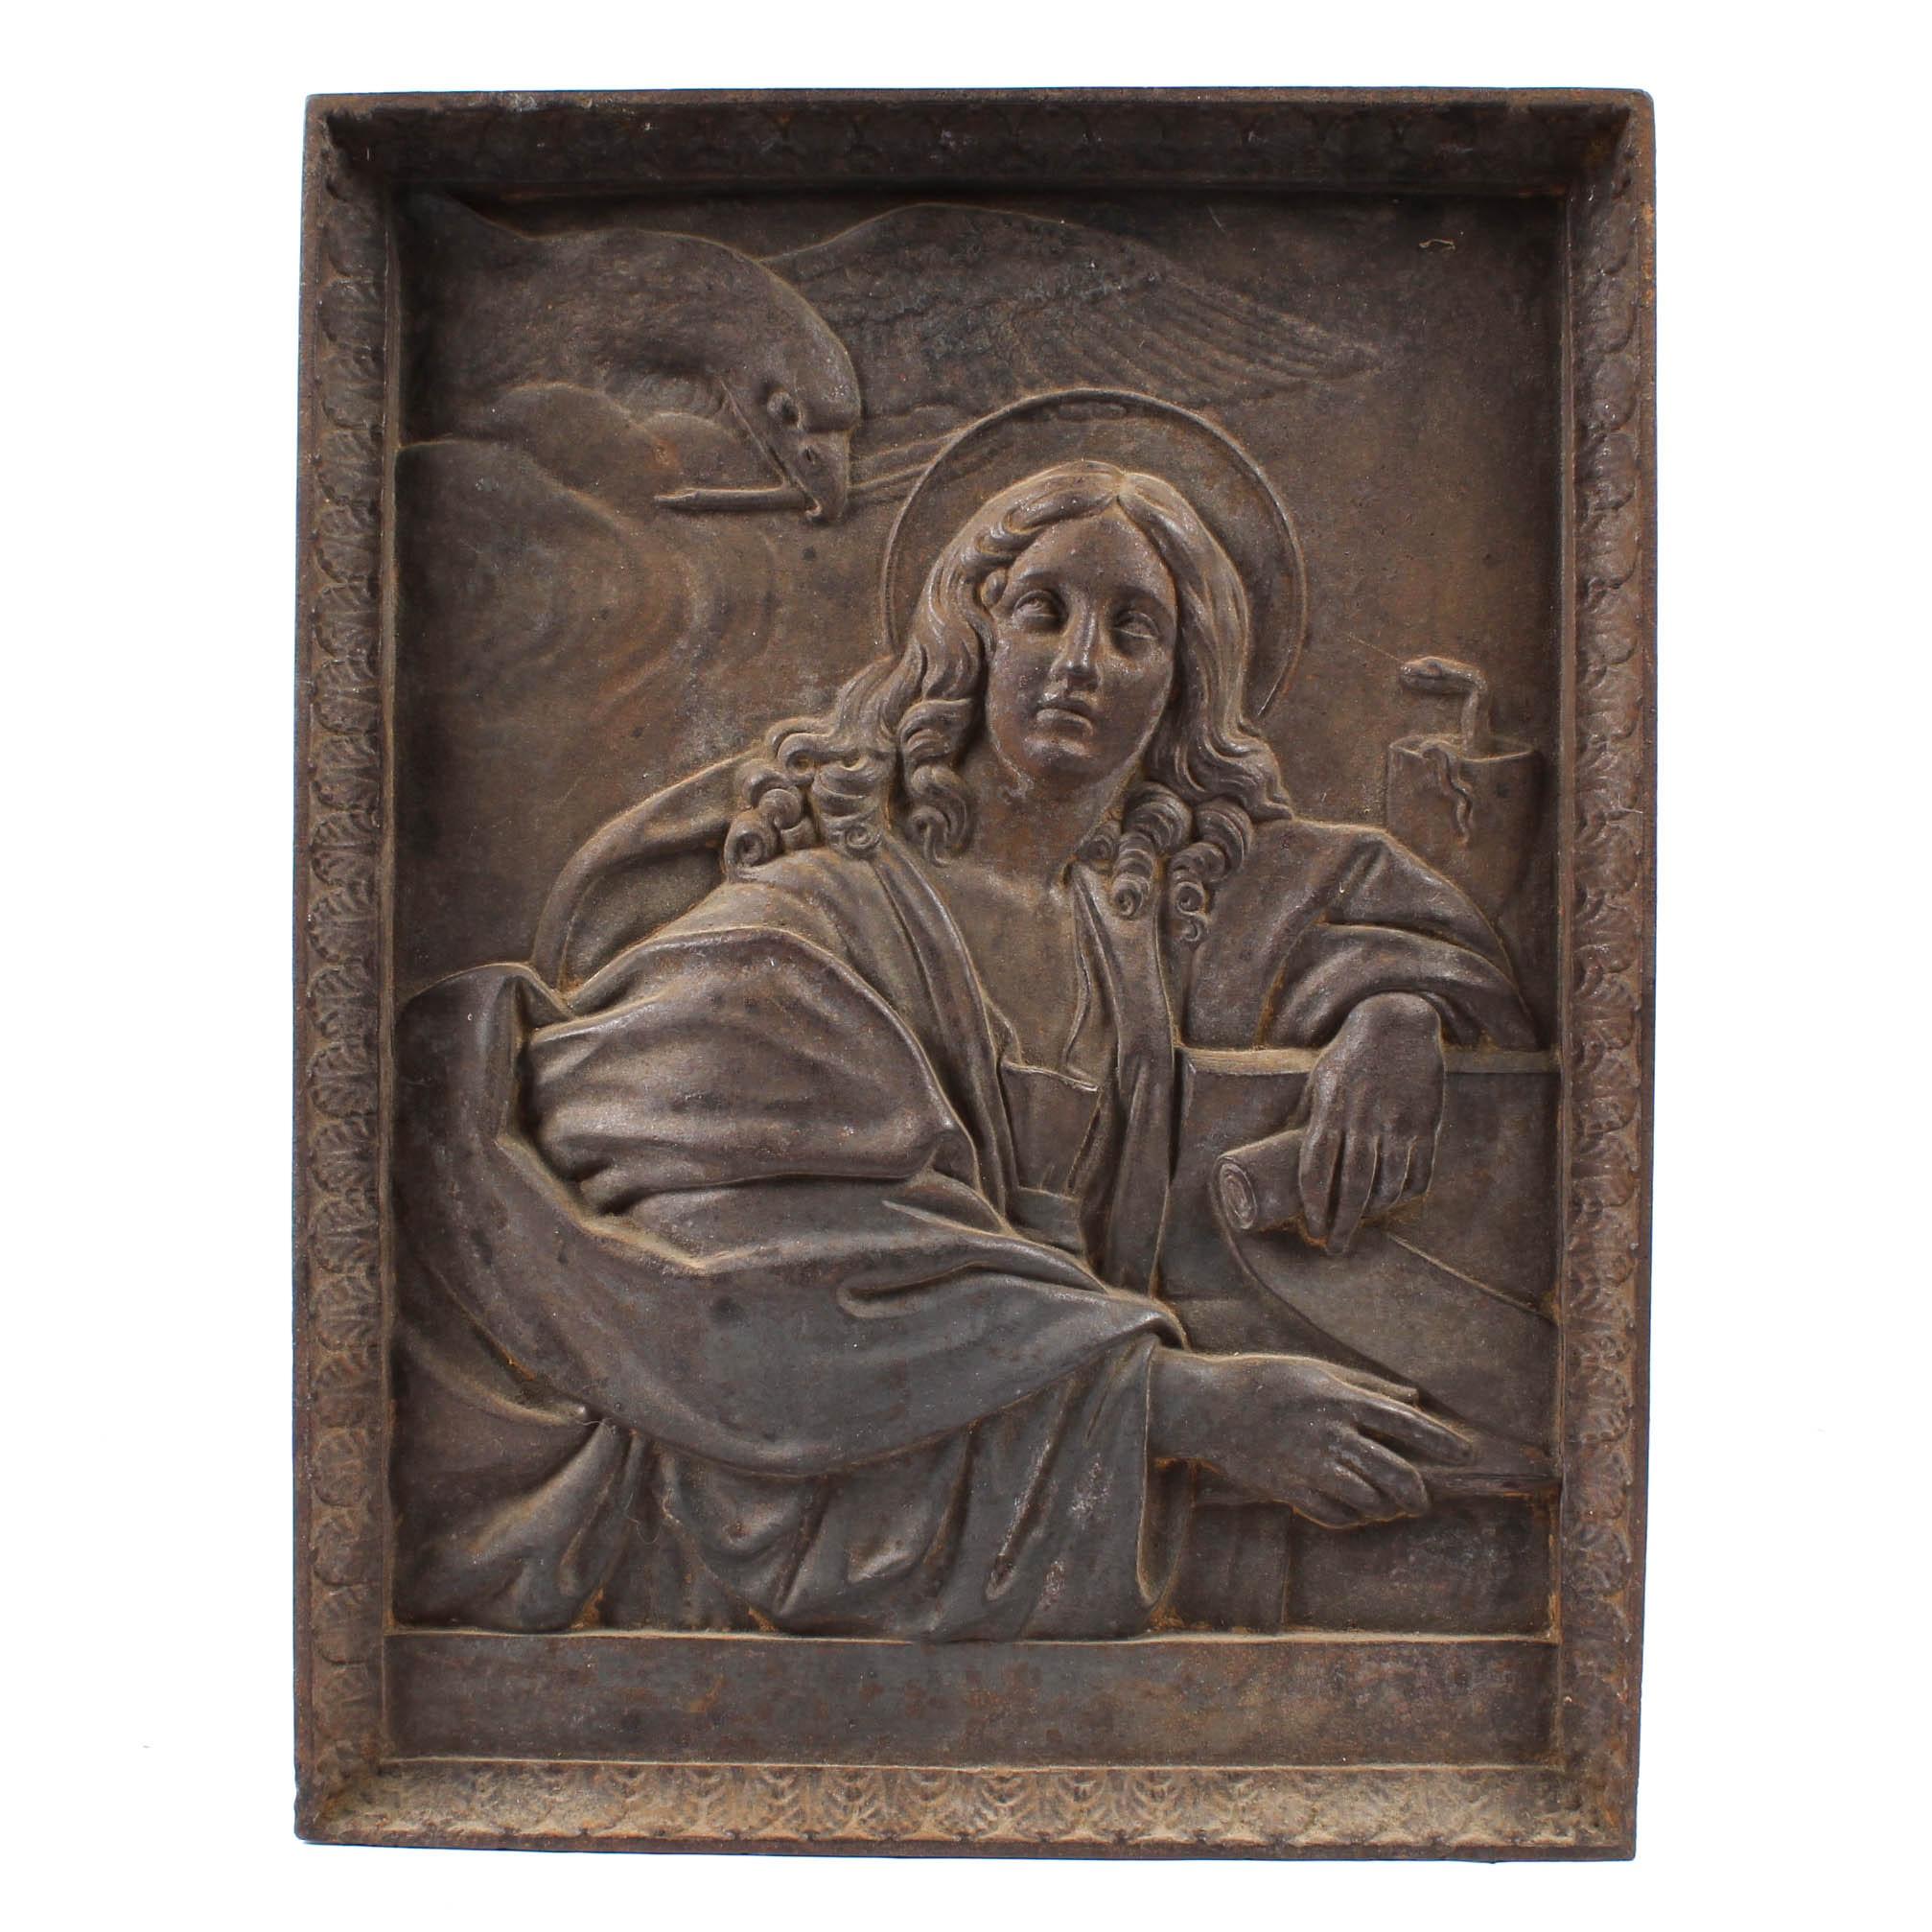 Antique John the Evangelist Cast Iron Plaque from Berlin Germany